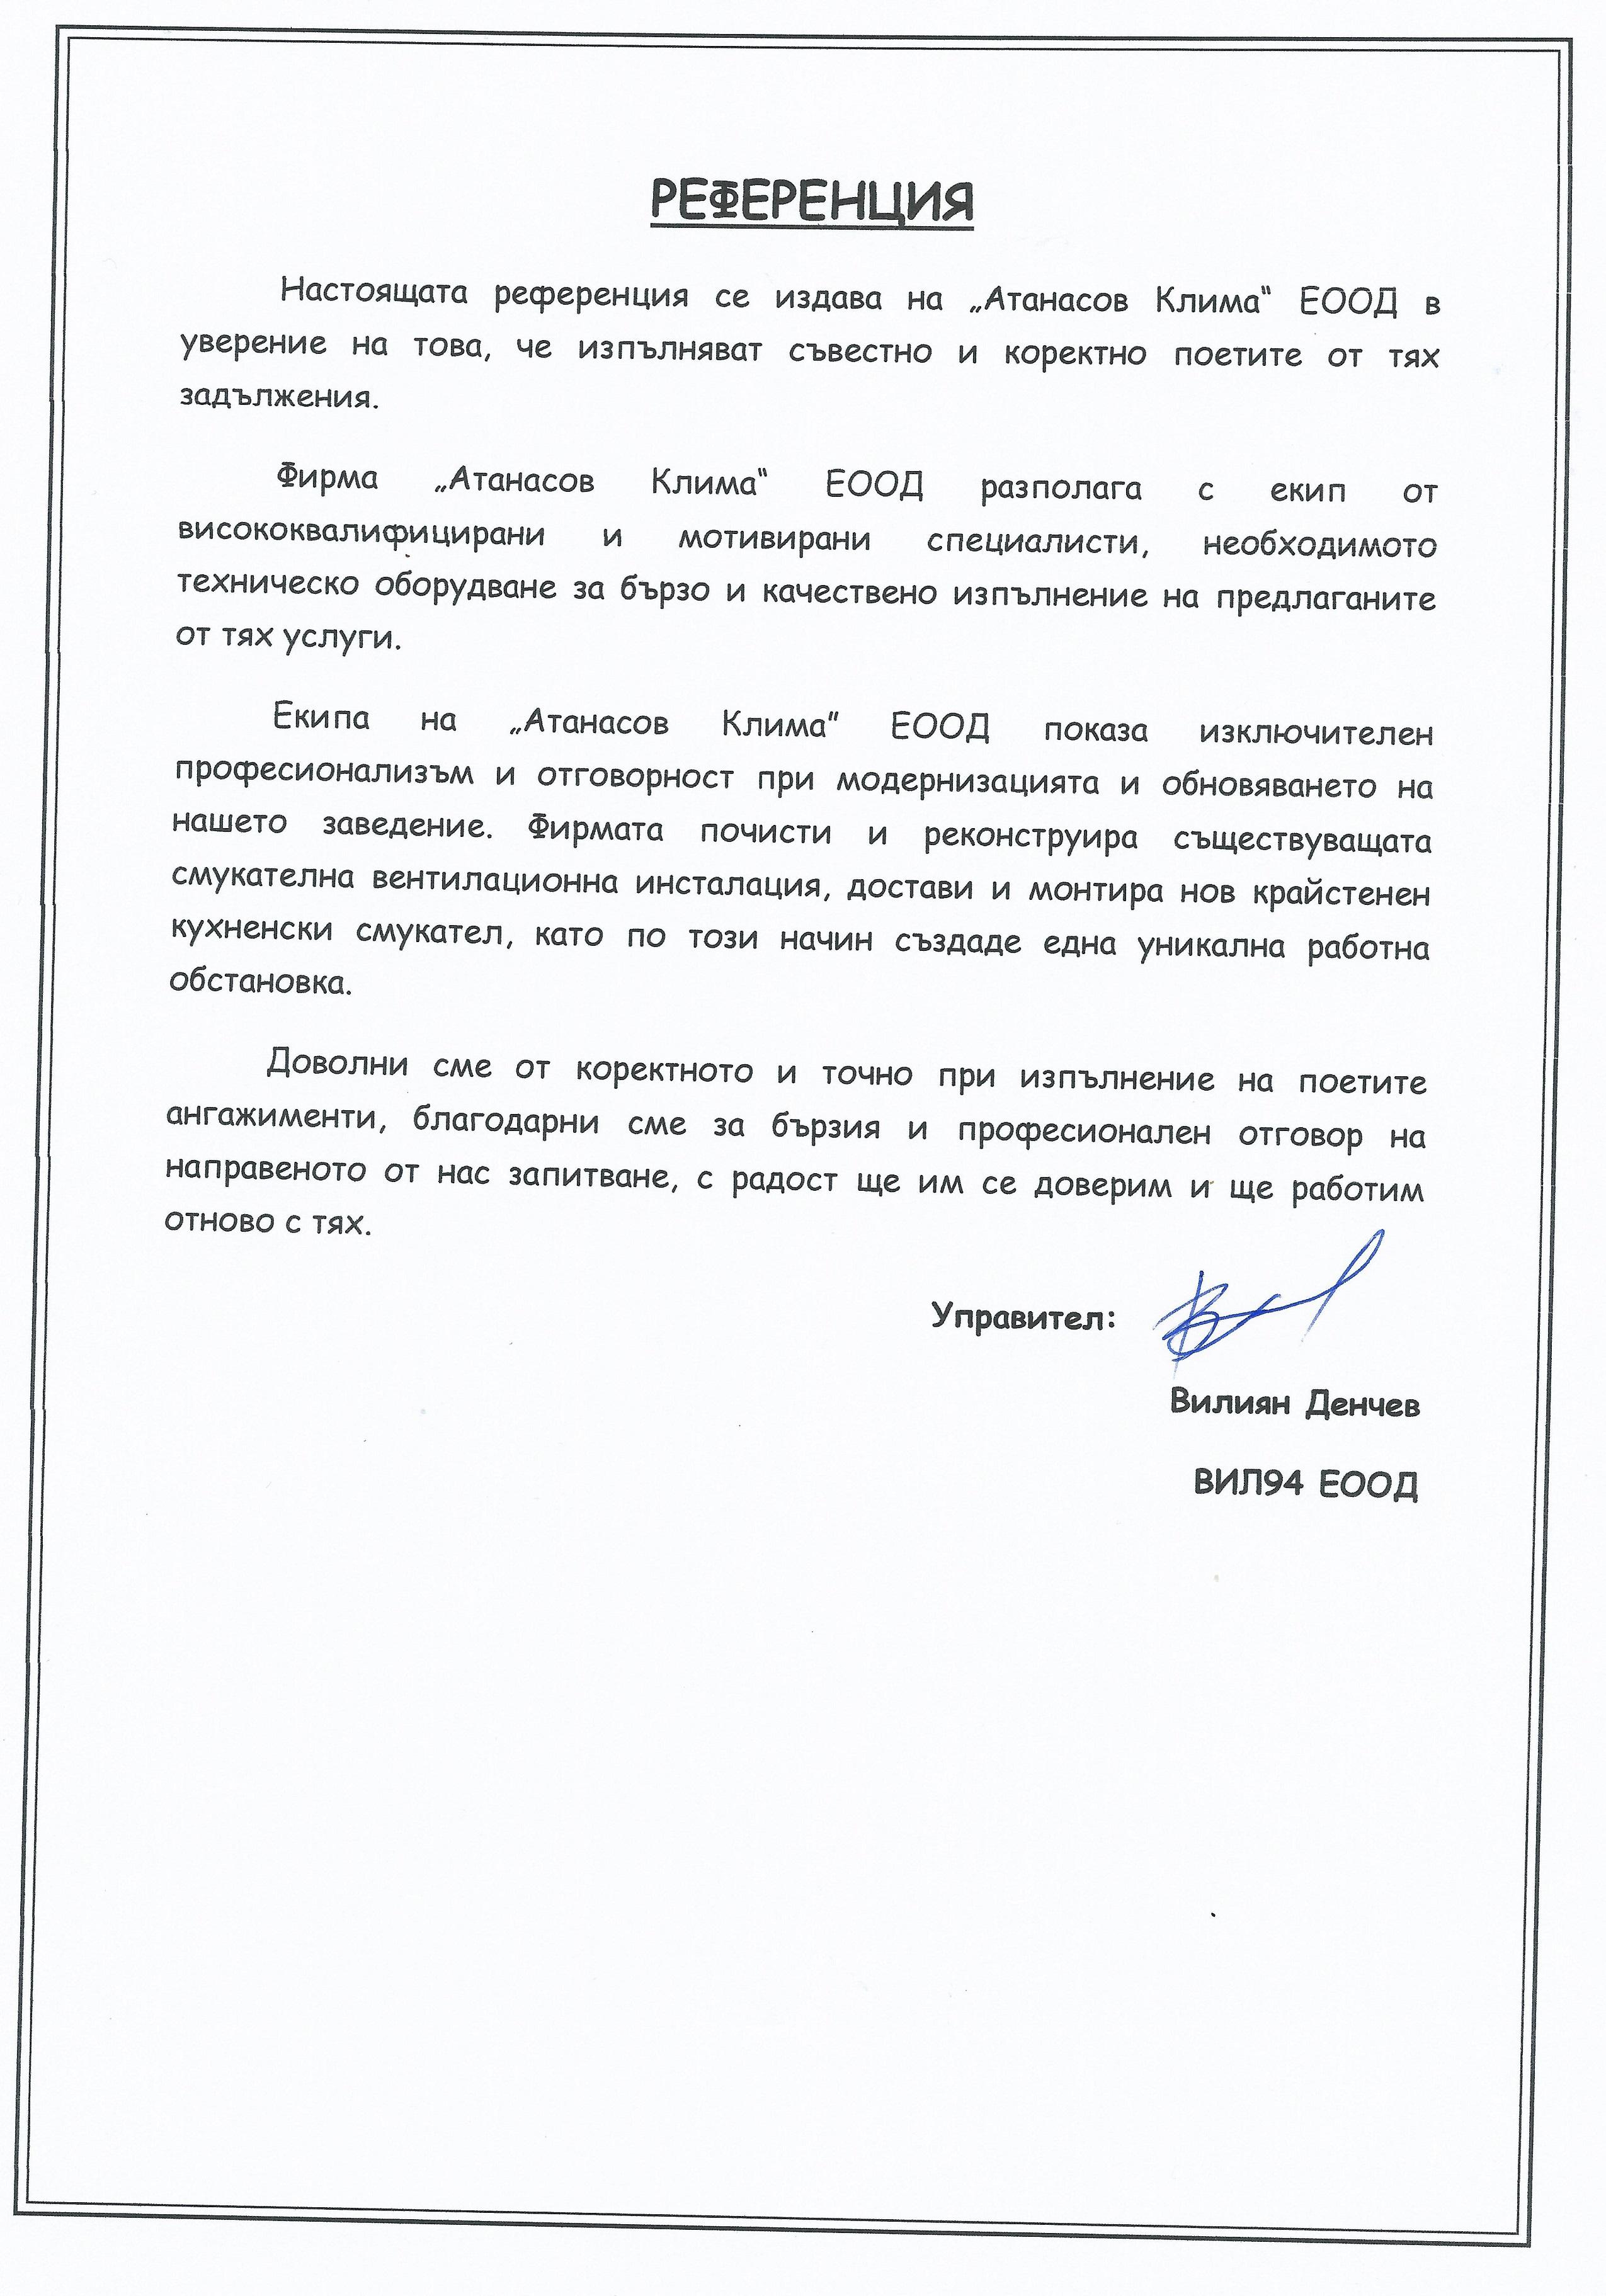 referenciya-viliyan-denchev